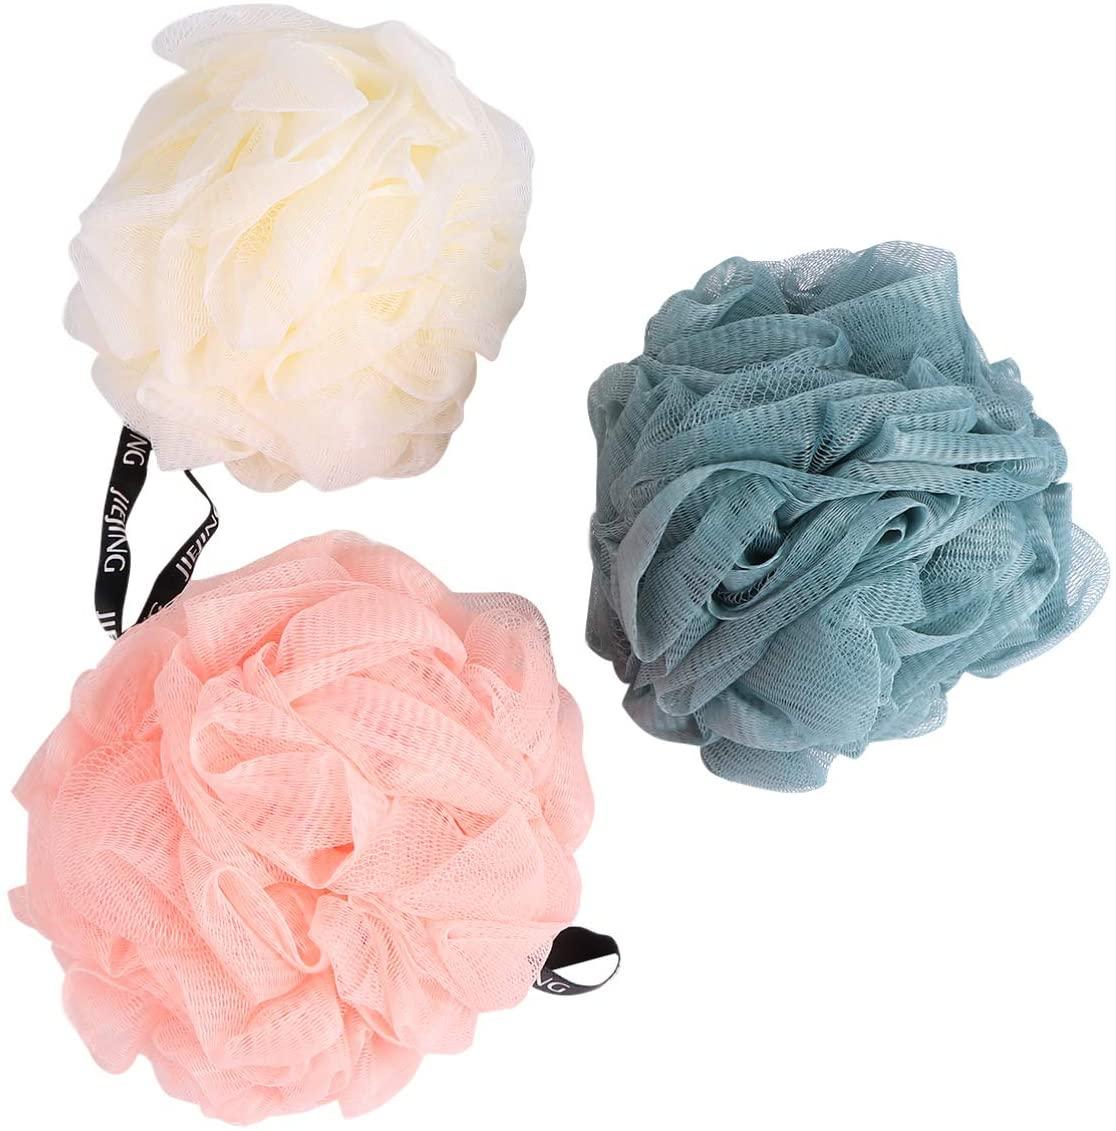 ARTIBETTER 3pcs Bath Shower Sponge Loofahs Mesh Pouf Shower Ball Scrub Balls for Men Women Girls Teens Children with Hanging Rope Pink, Beige and Blue